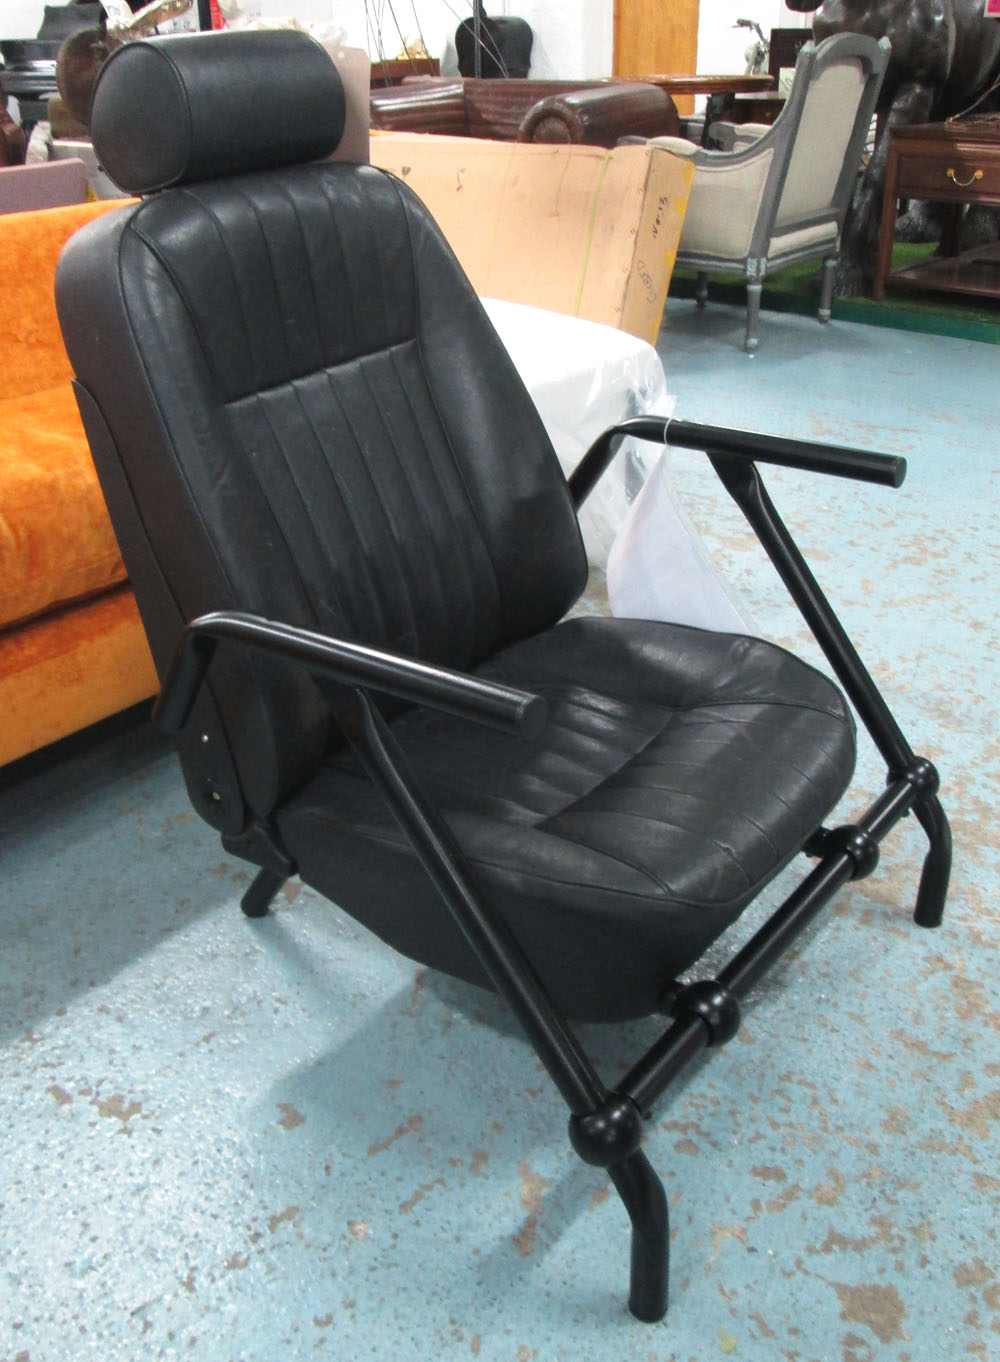 JOE HALL ARMCHAIR car seat style inspired by Ron Arad